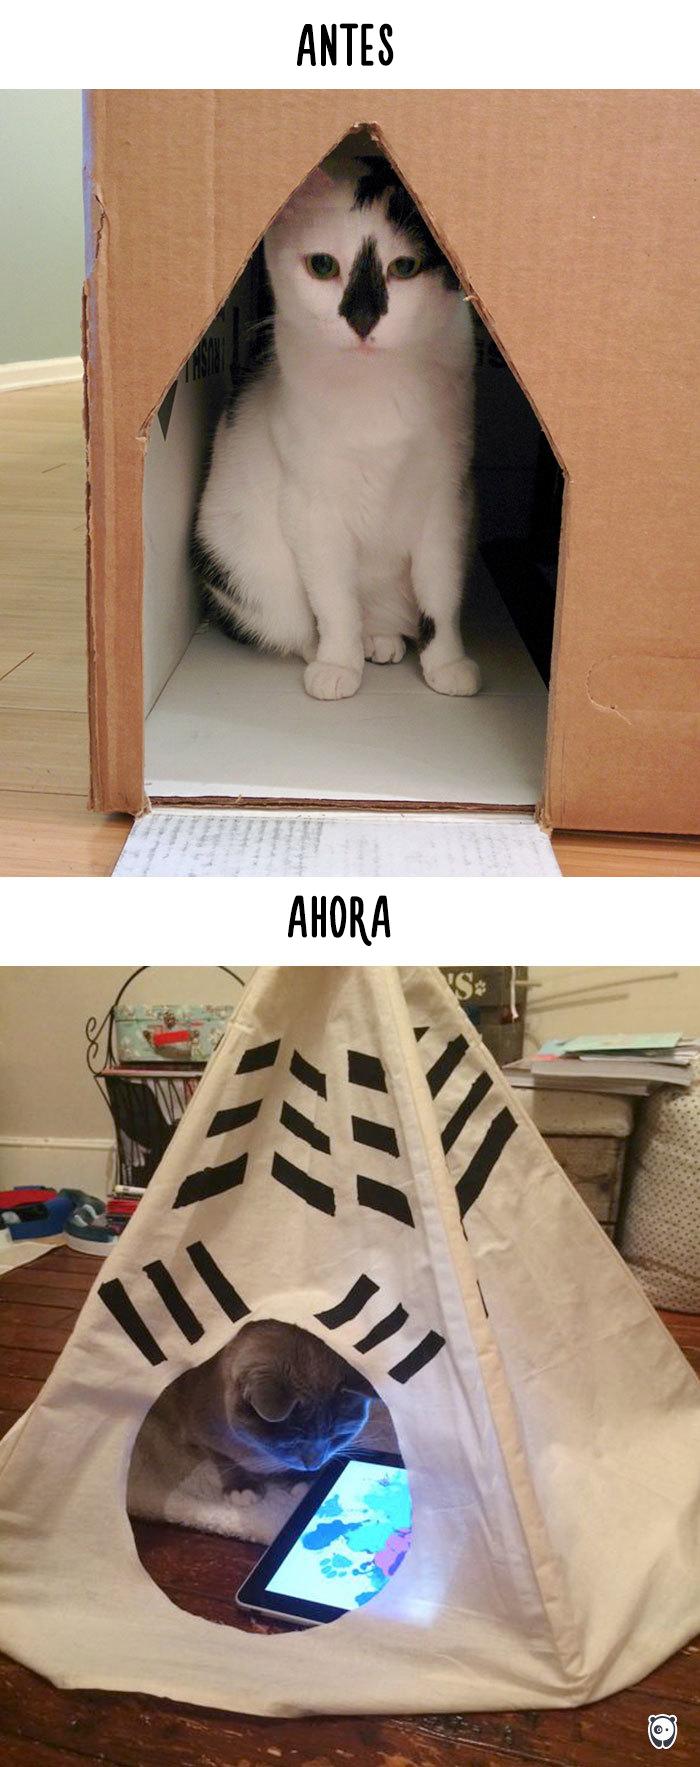 antes-ahora-gatos-tecnologia-8